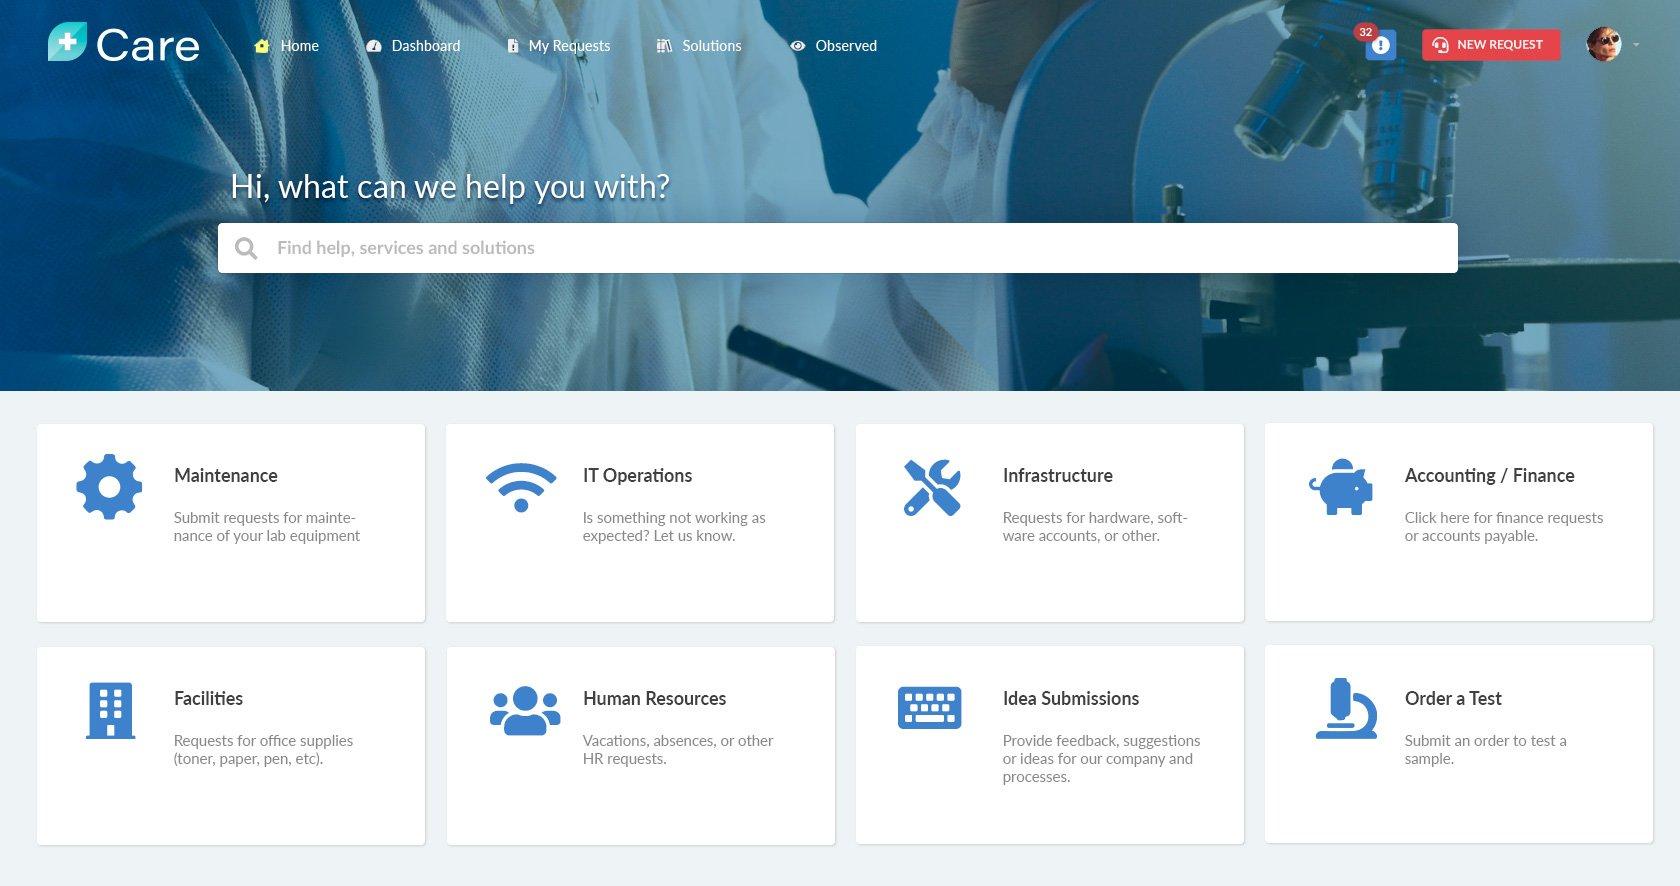 Self-service portal for a medical company